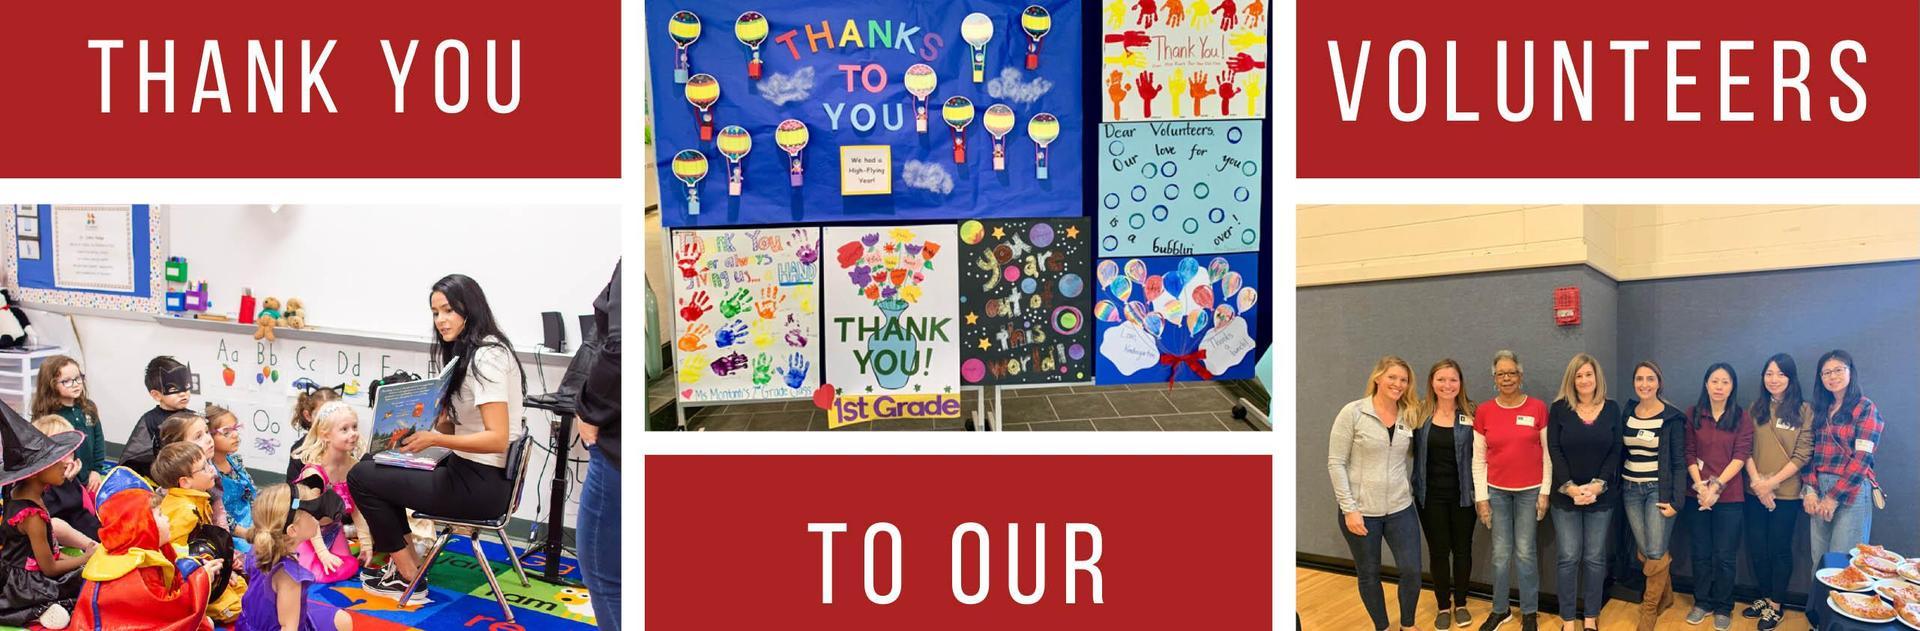 thank you volunteers banner